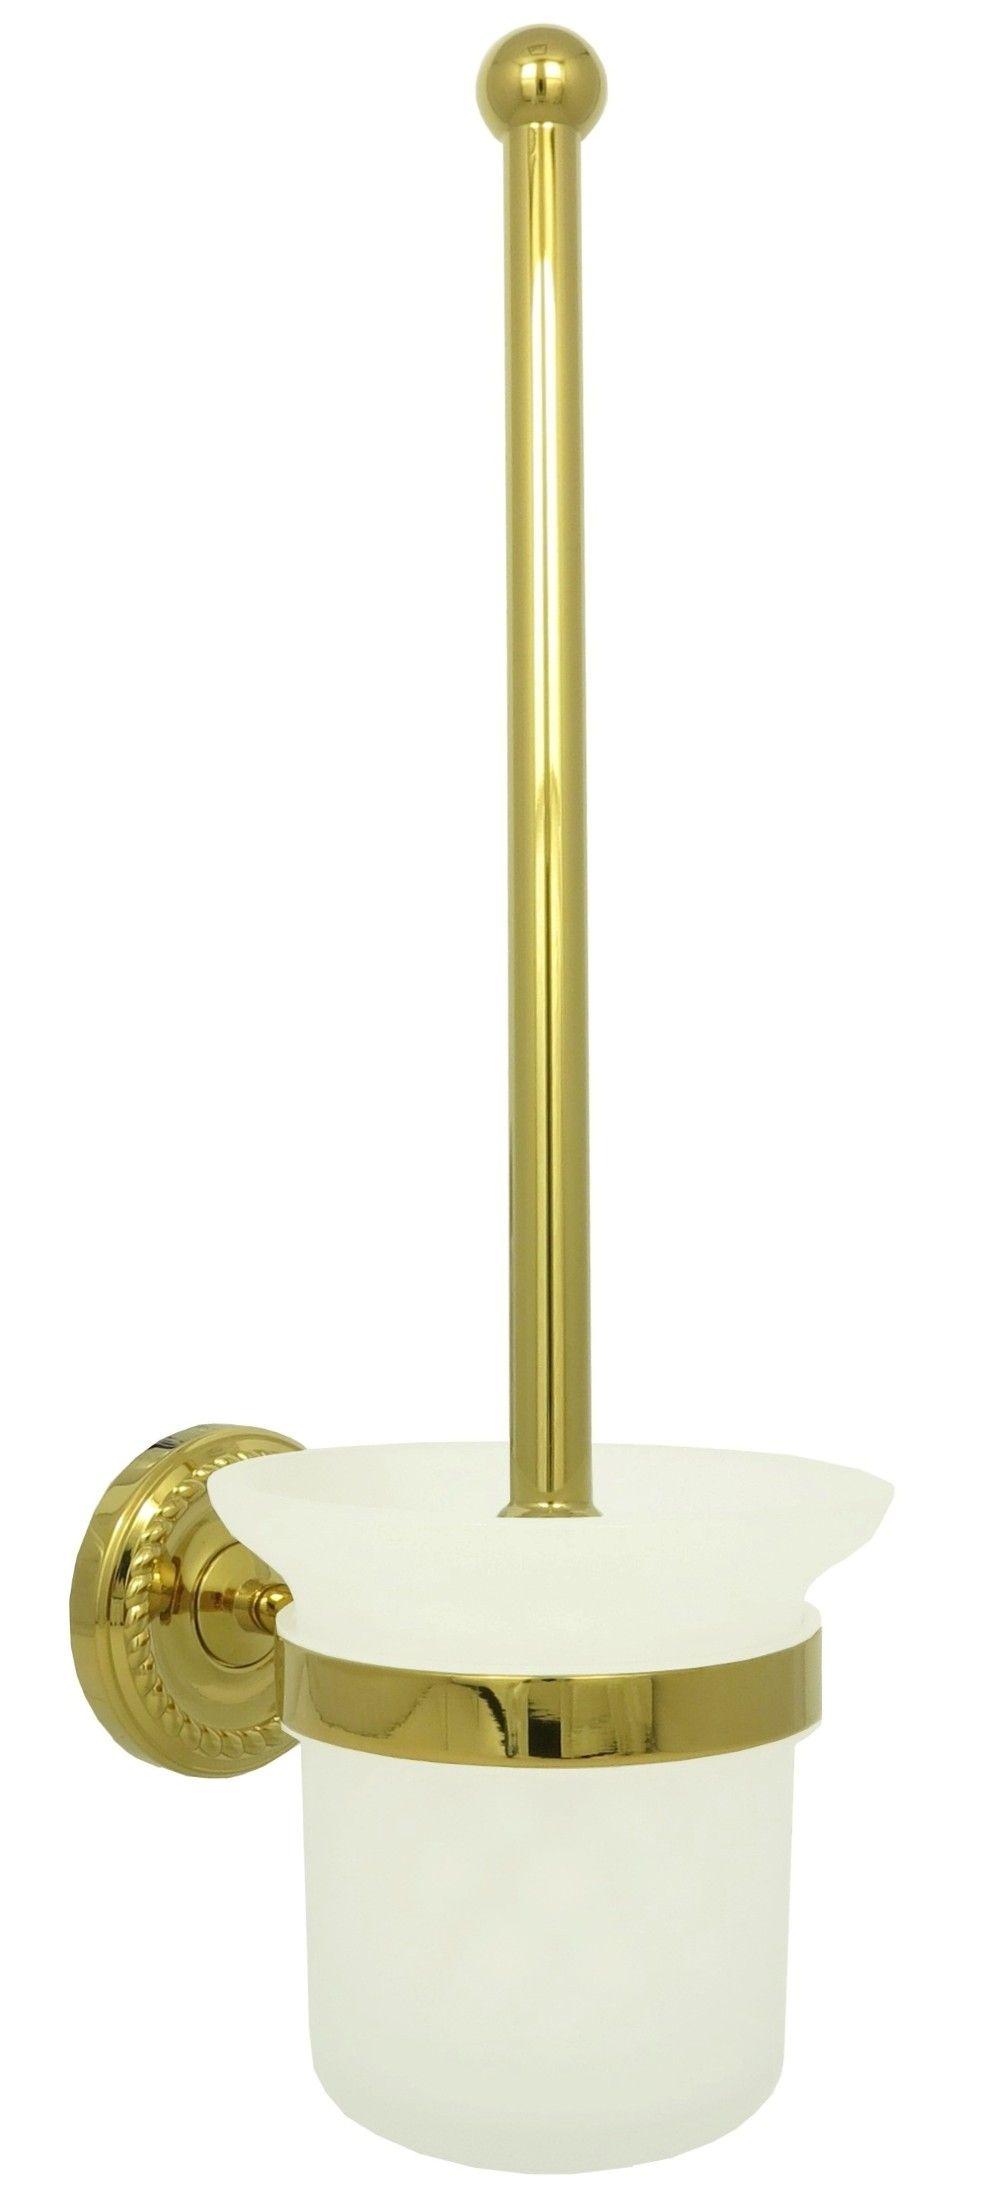 Retro WC Toiletten Bürstengarnitur Bürstenhalter Milchglas Gold 9008    Dirks Traumbad